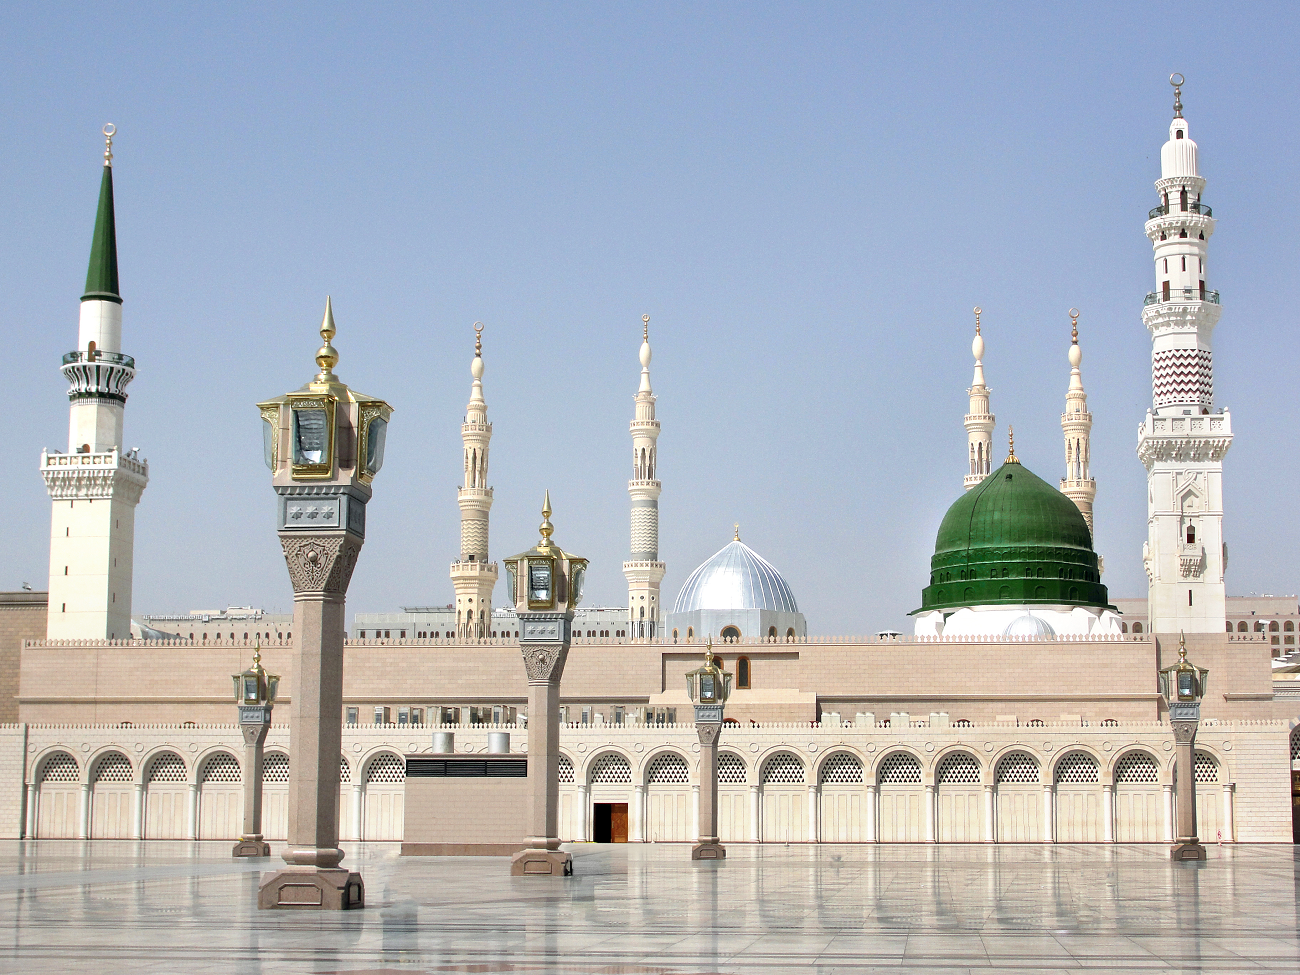 Mosque of the Prophet Muhammad Sallallahu alaihi wa sallam Madinah